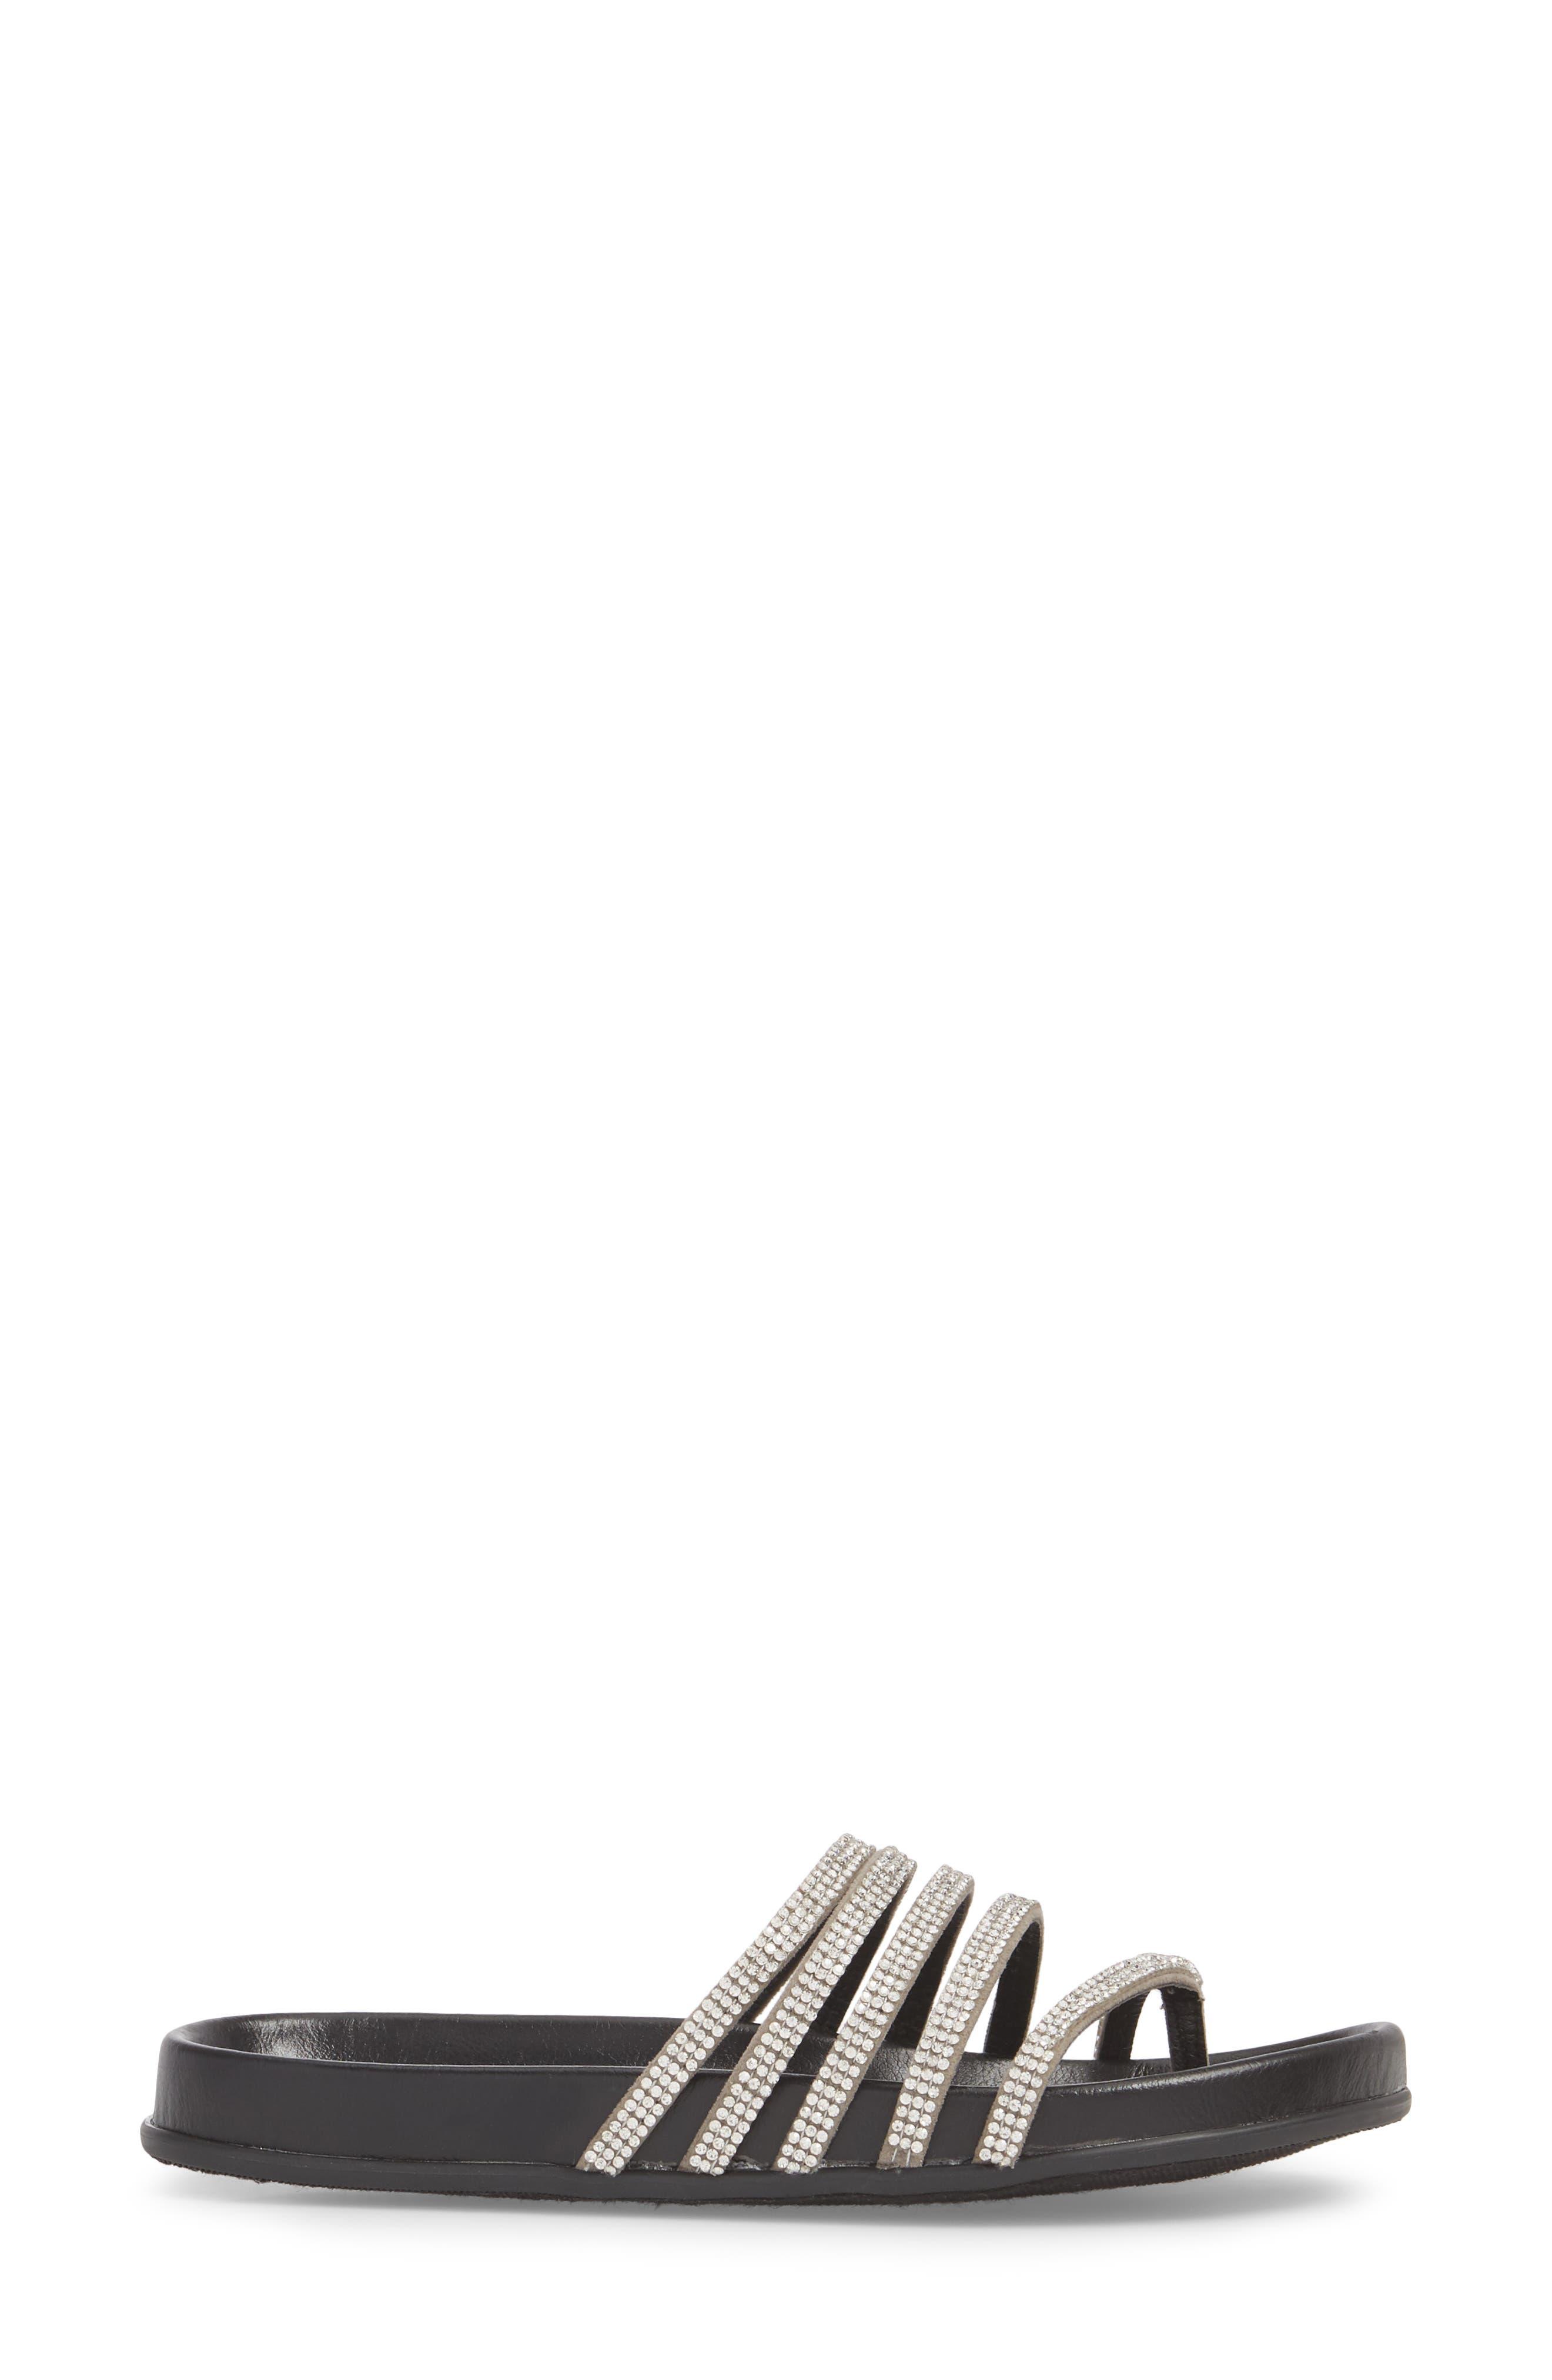 Kendari Sandal,                             Alternate thumbnail 3, color,                             Silver